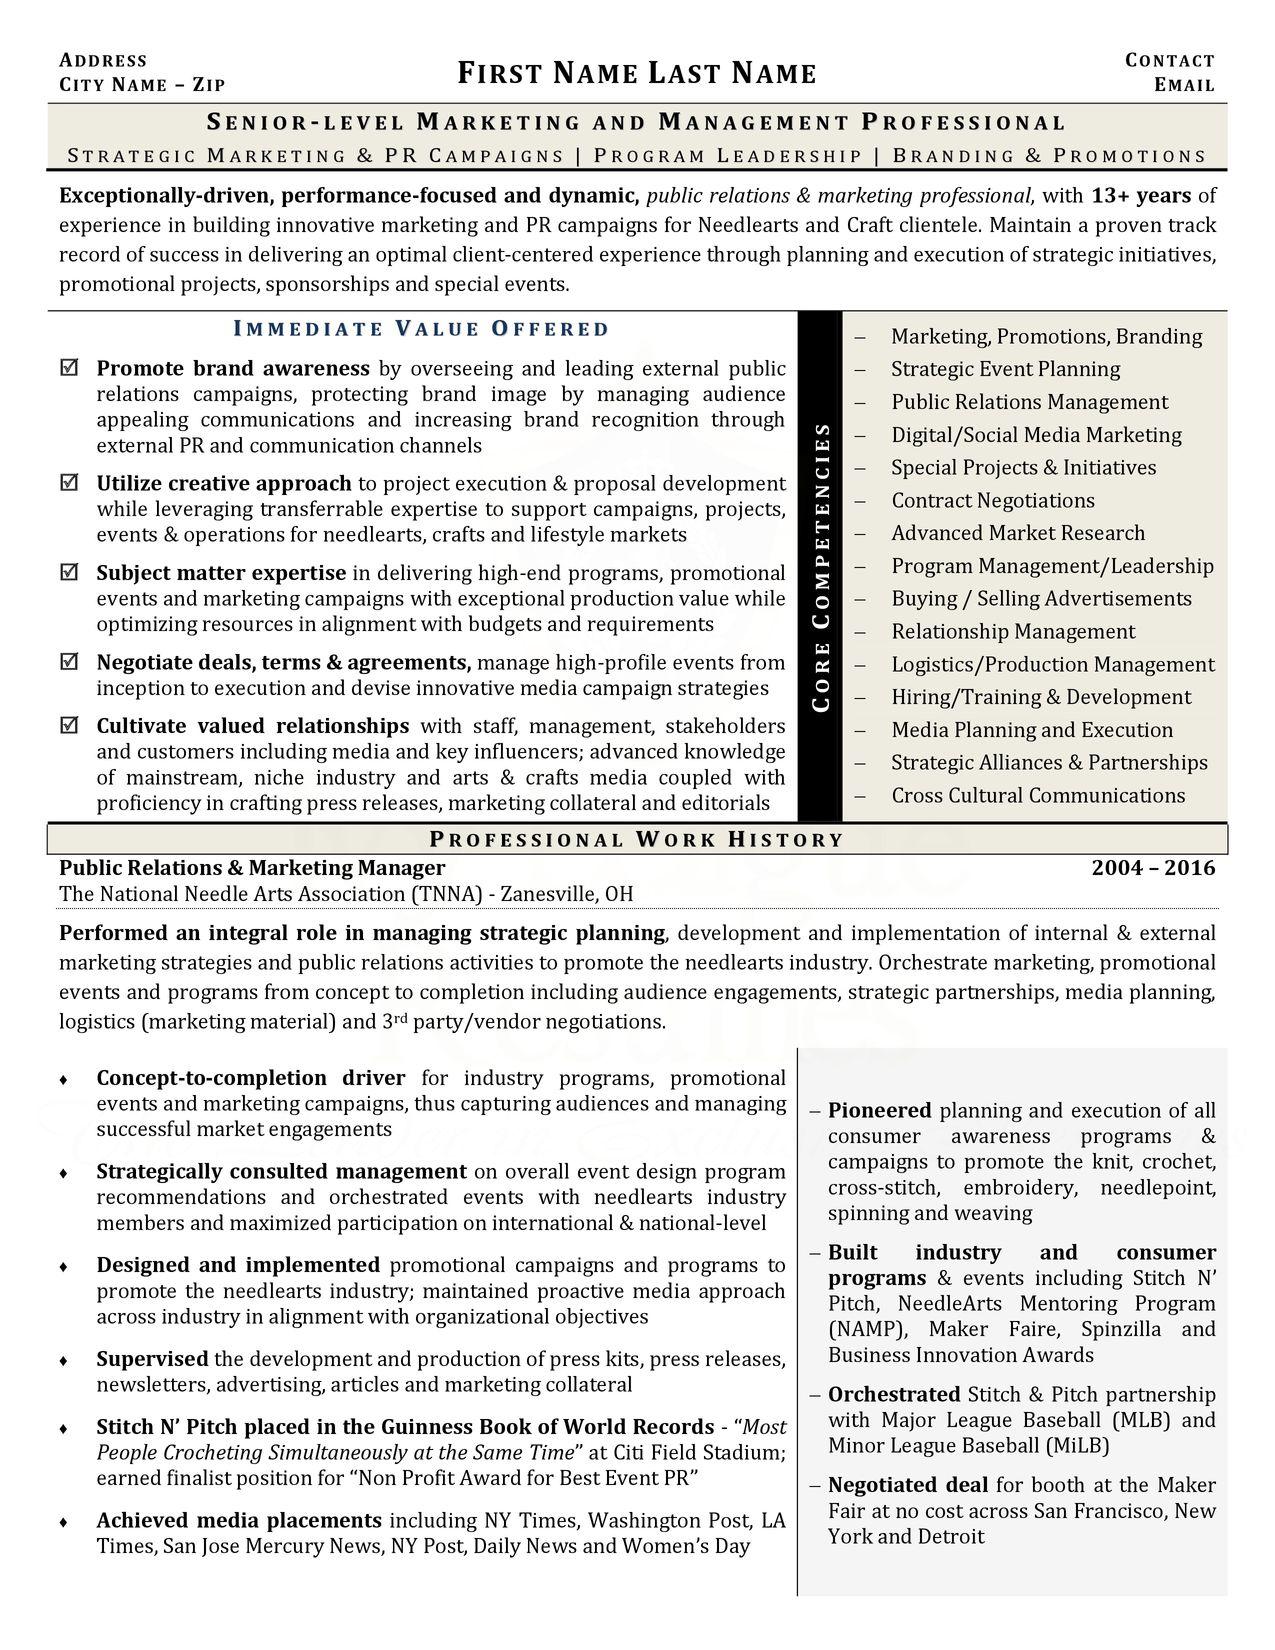 Marketing Management Sample Resume